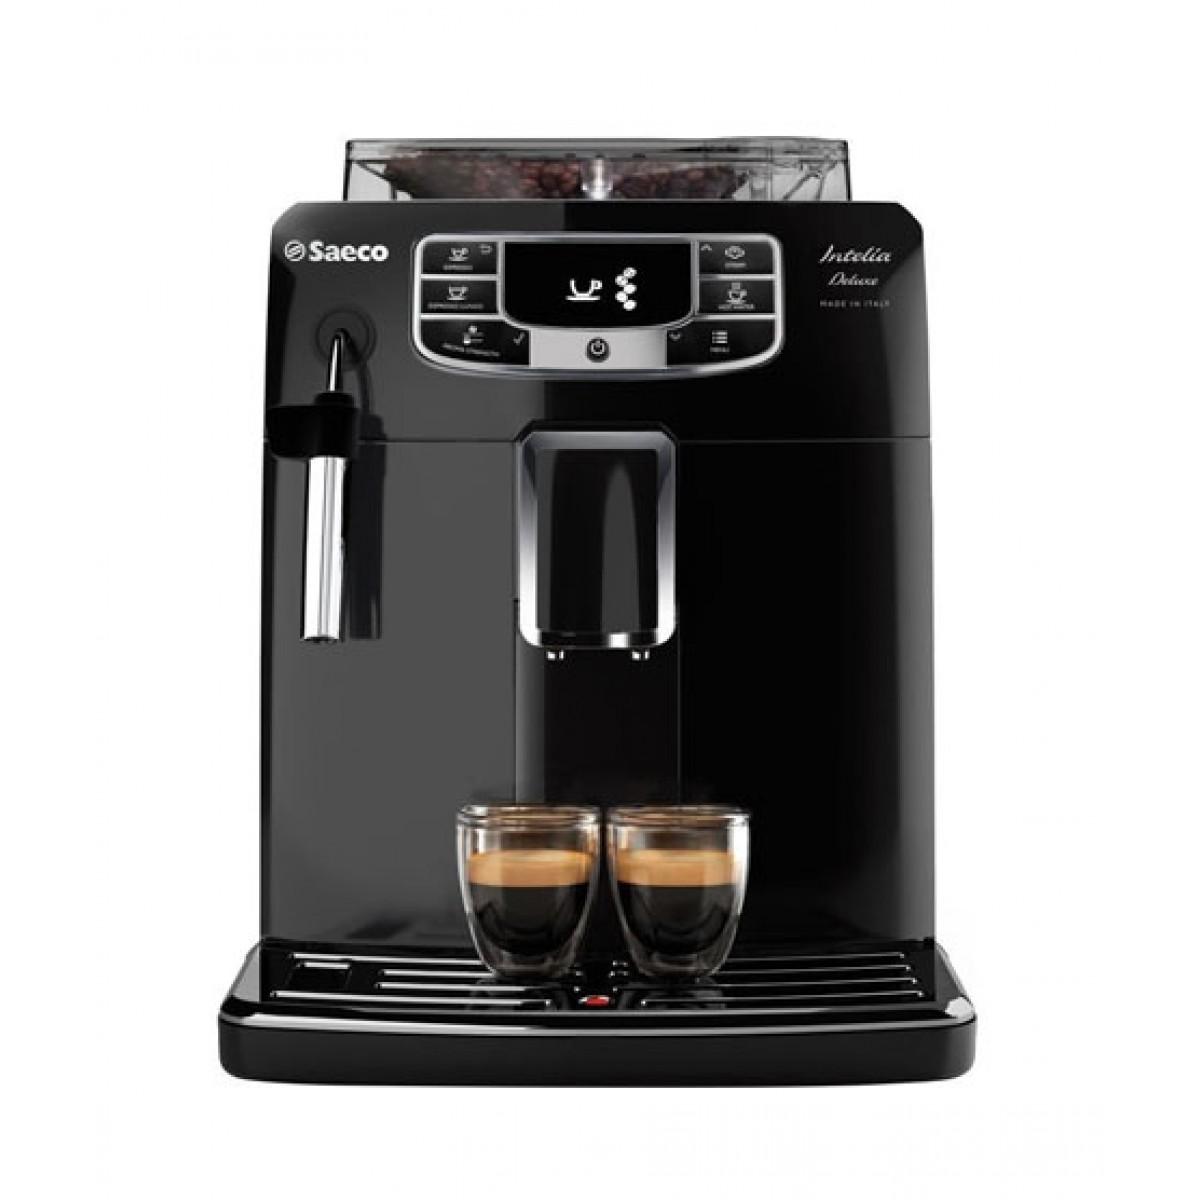 Philips Saeco Espresso Coffee Machine Price in Pakistan ...